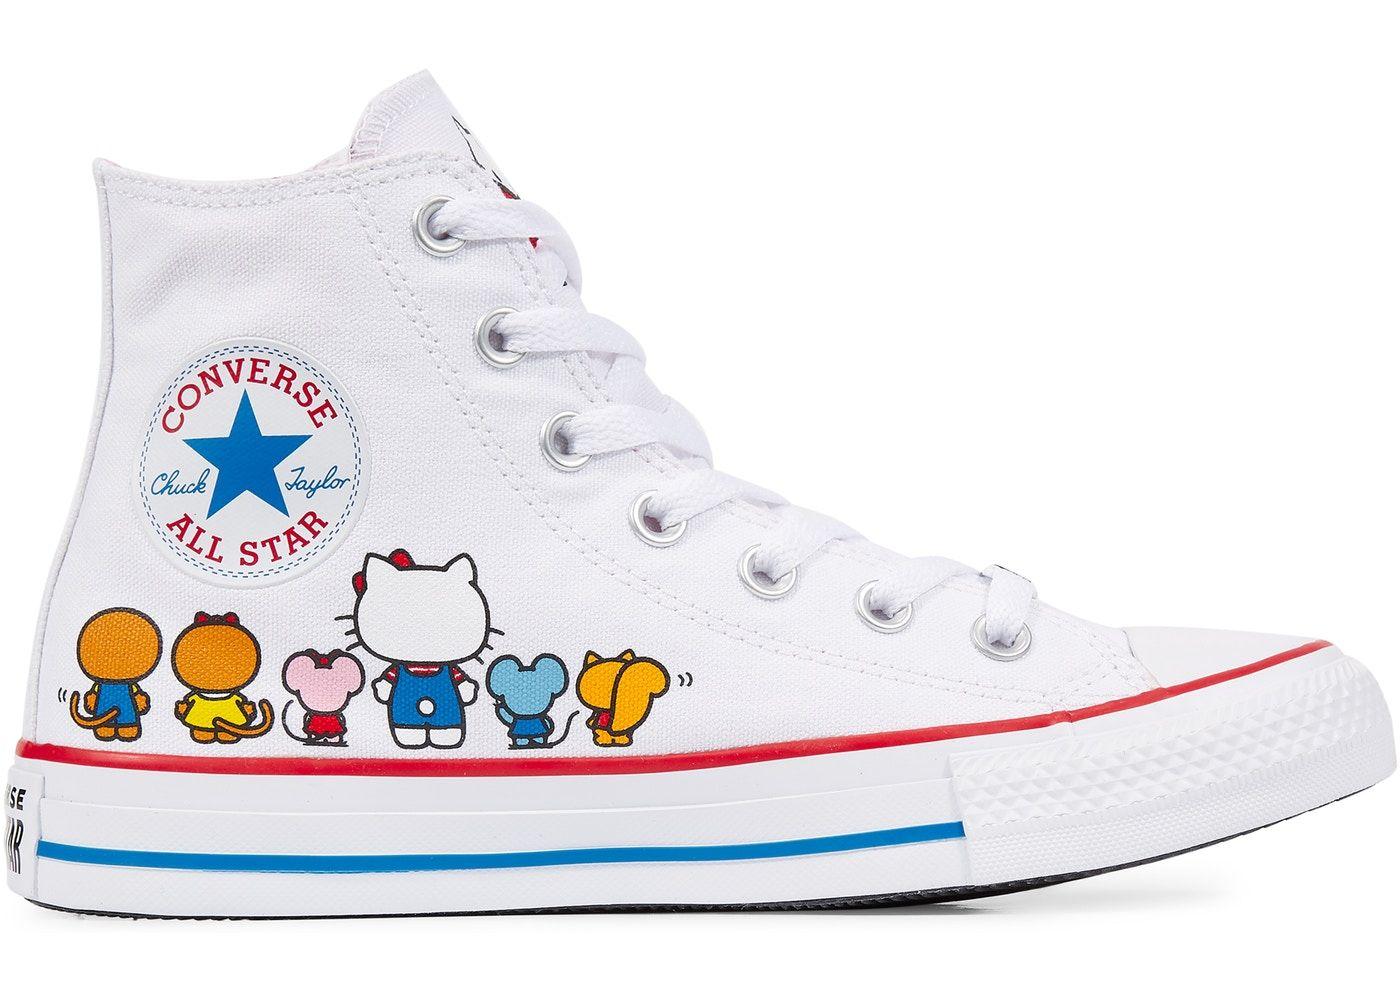 converse all star hi zapatos deportivos mujer hello kitty